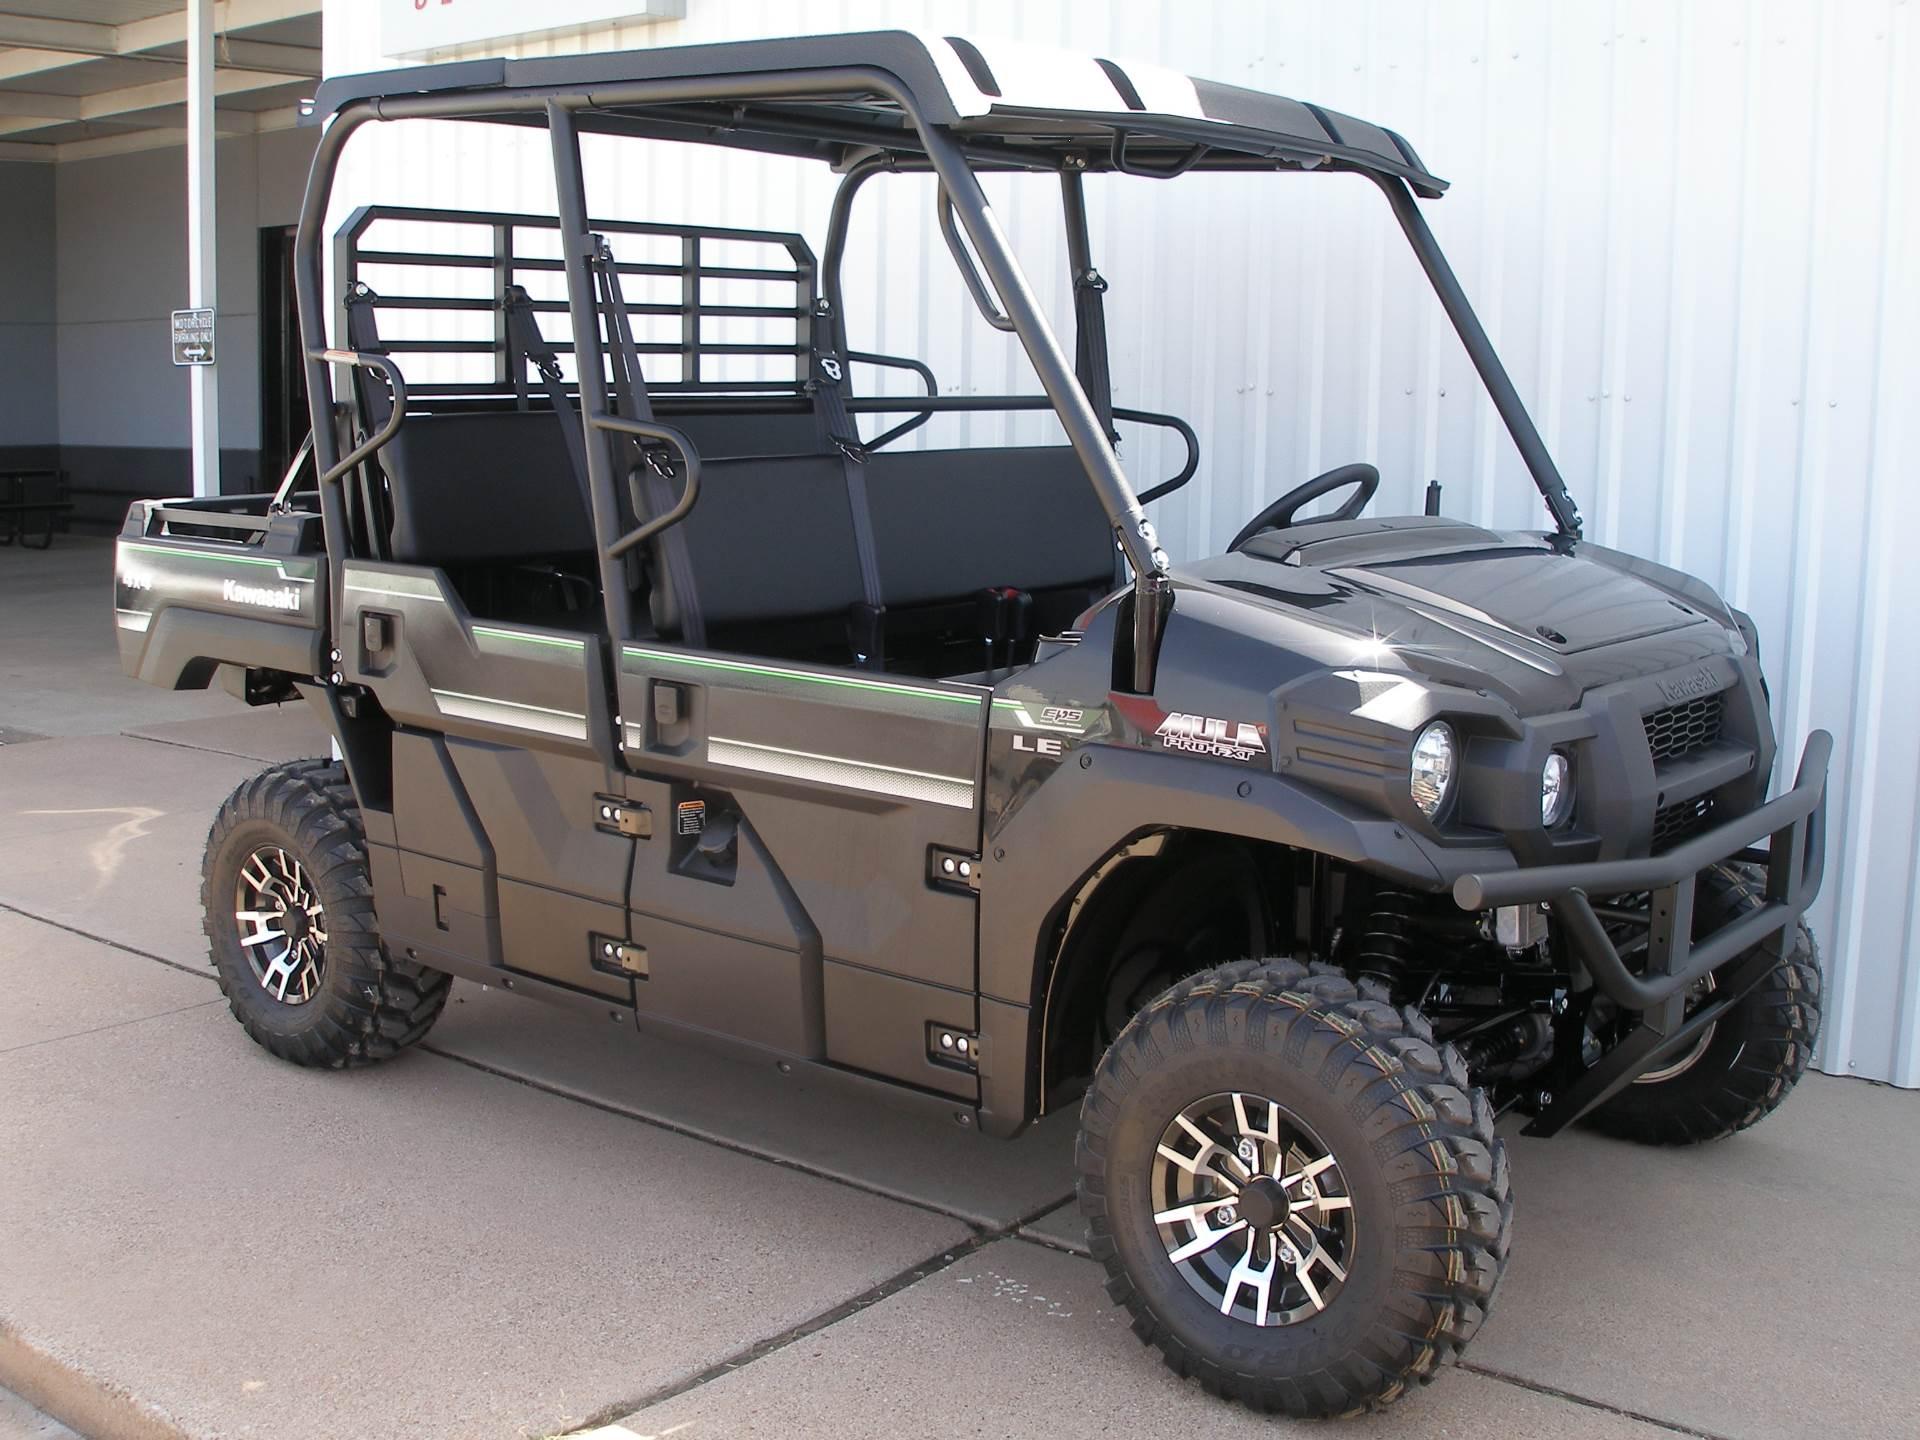 2019 Kawasaki Mule PRO-FXT EPS LE in Abilene, Texas